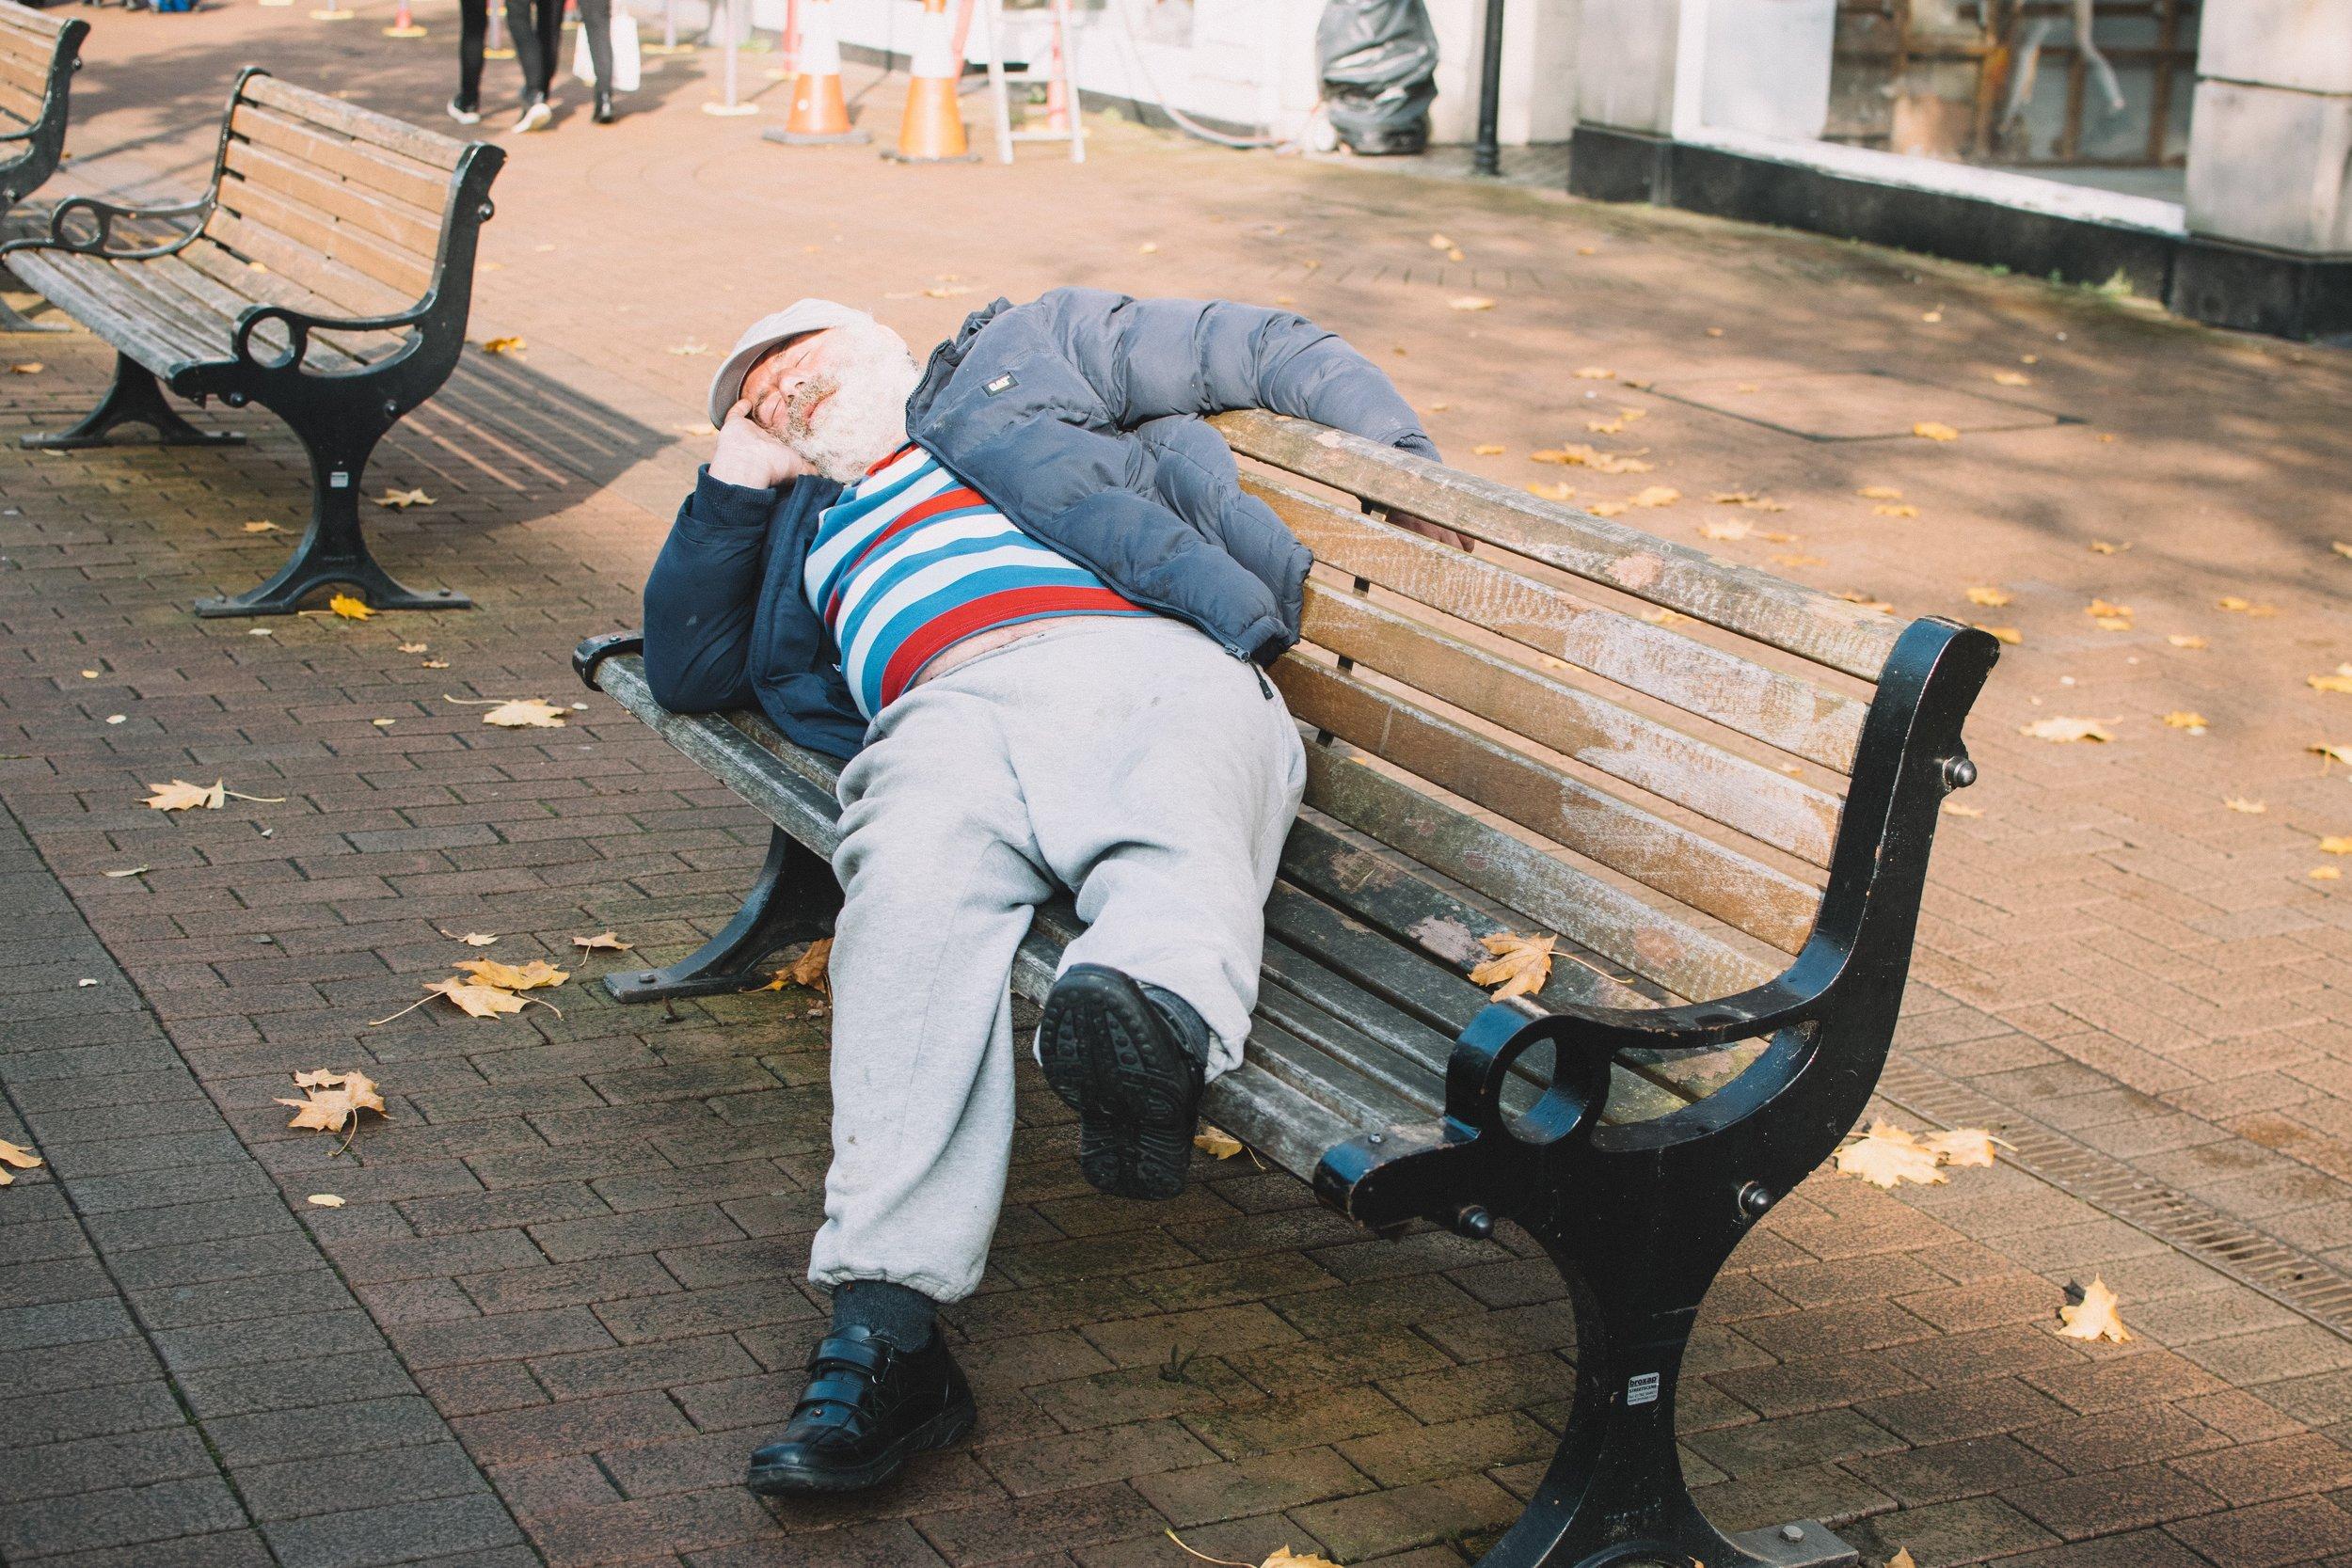 Harry Renton Hippo Magazine Old Man Sleeping on Bench